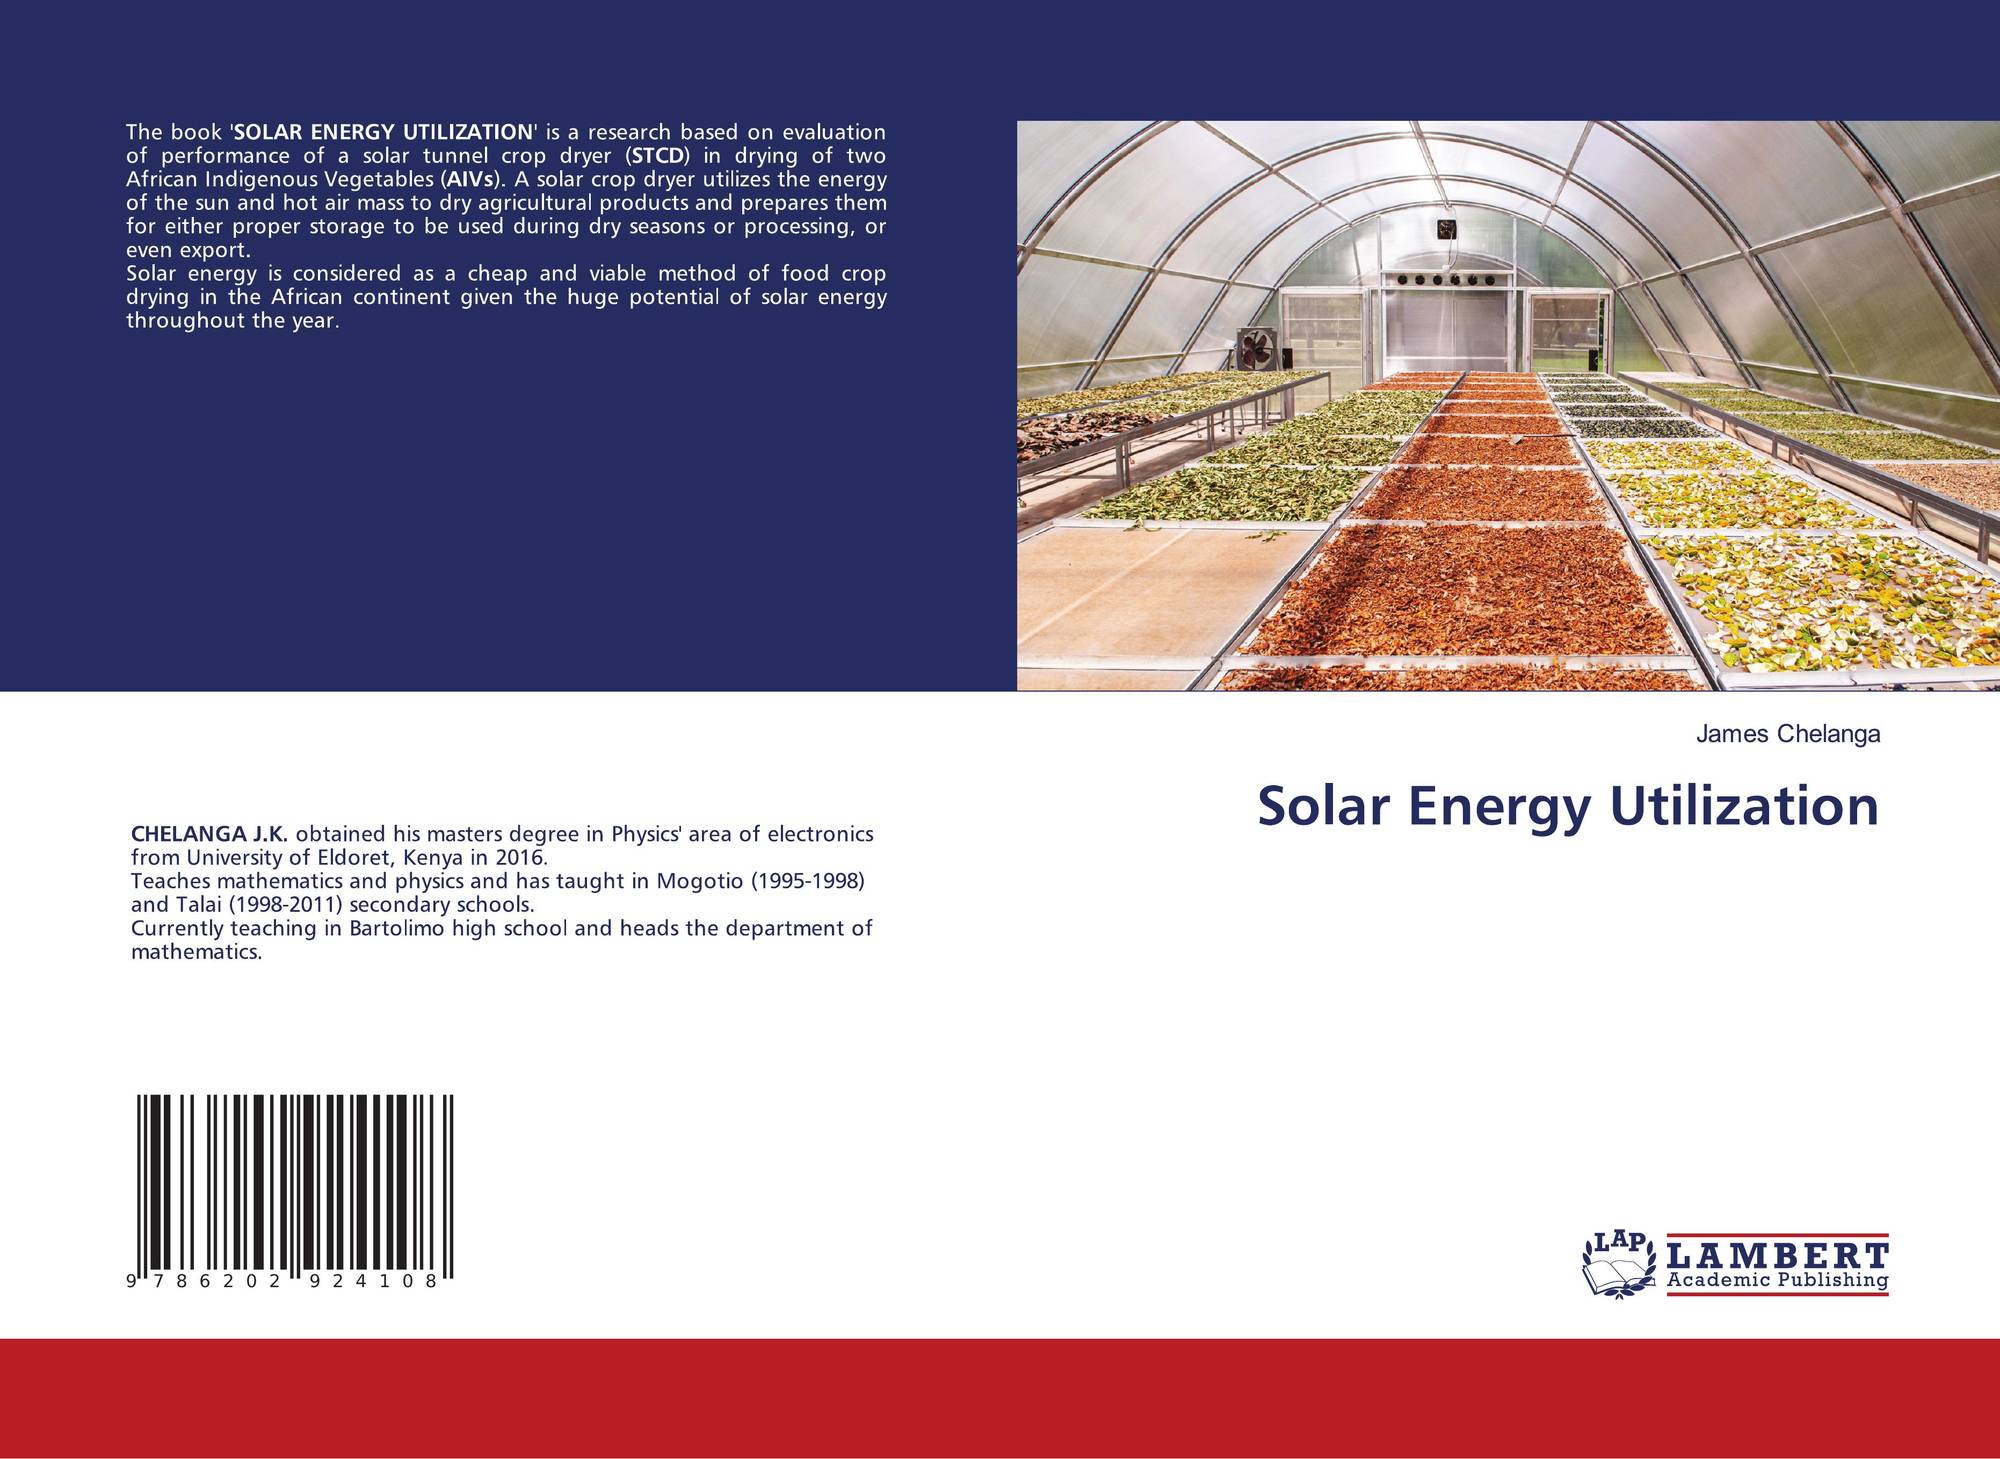 Solar Energy Utilization 978 620 2 92410 8 6202924101 9786202924108 By James Chelanga